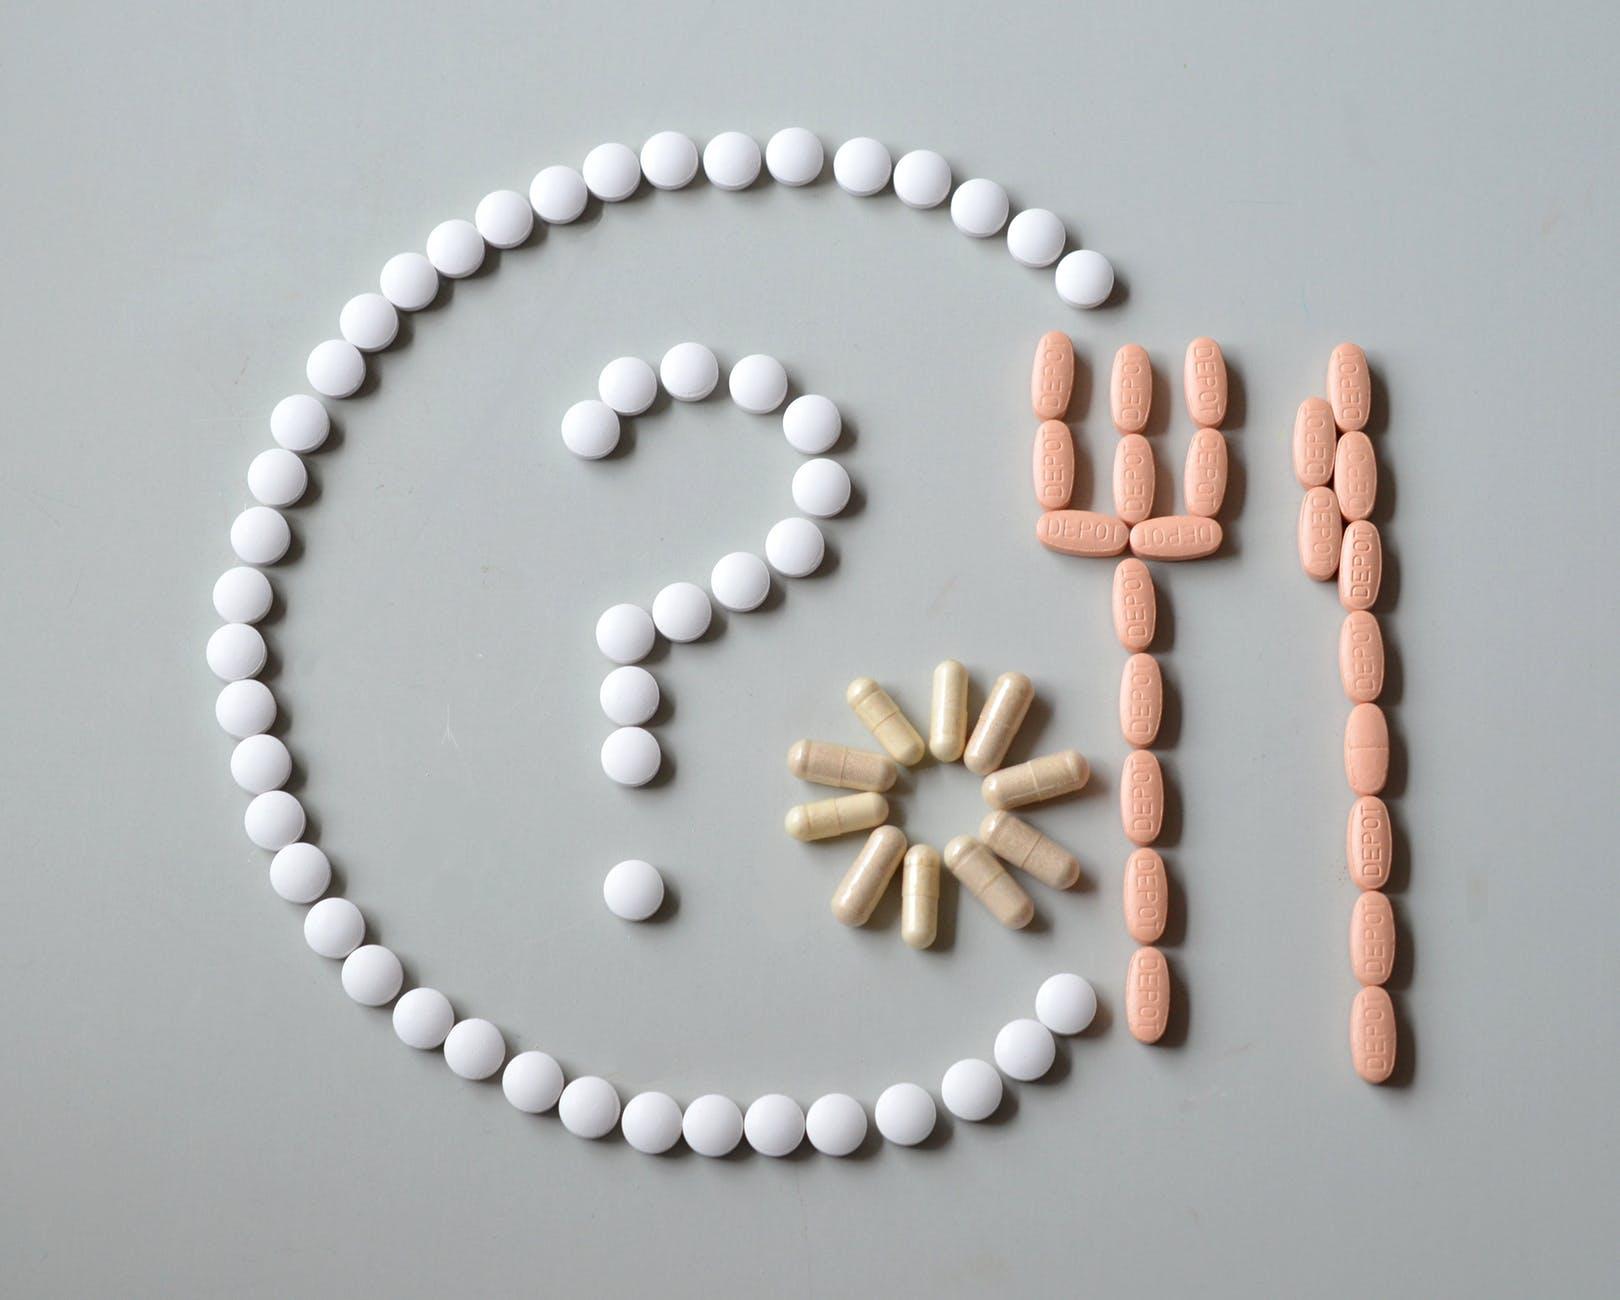 https://www.pexels.com/photo/white-and-beige-medicine-47073/